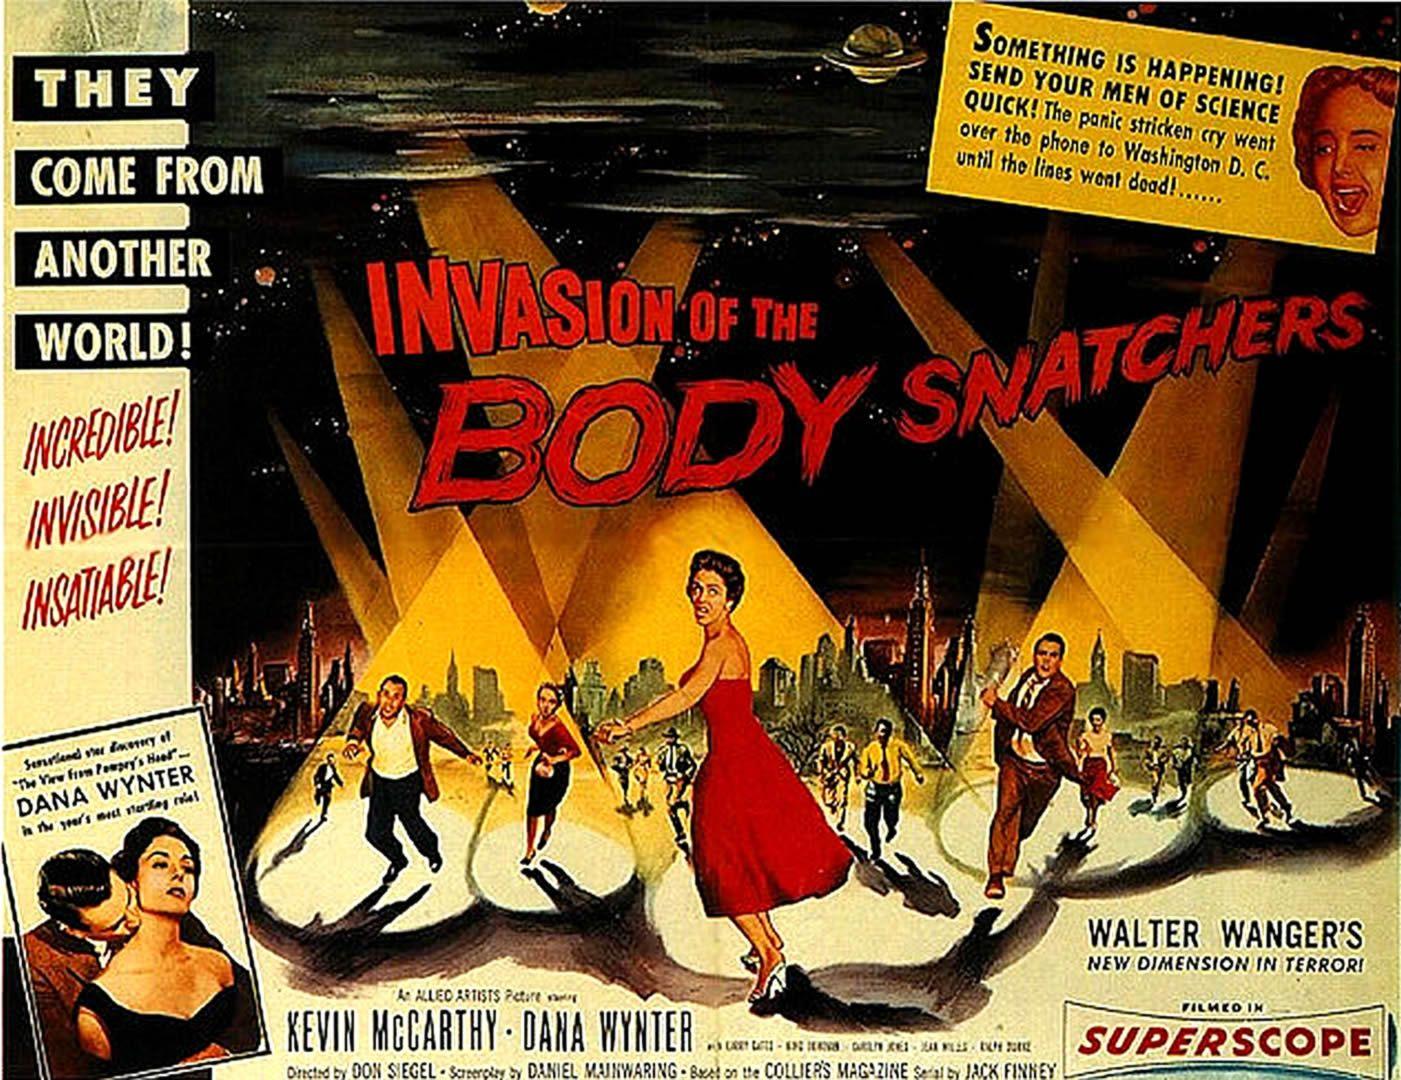 SNATCHERS Landscape   alien invasion b movie posters wallpaper 1401x1080